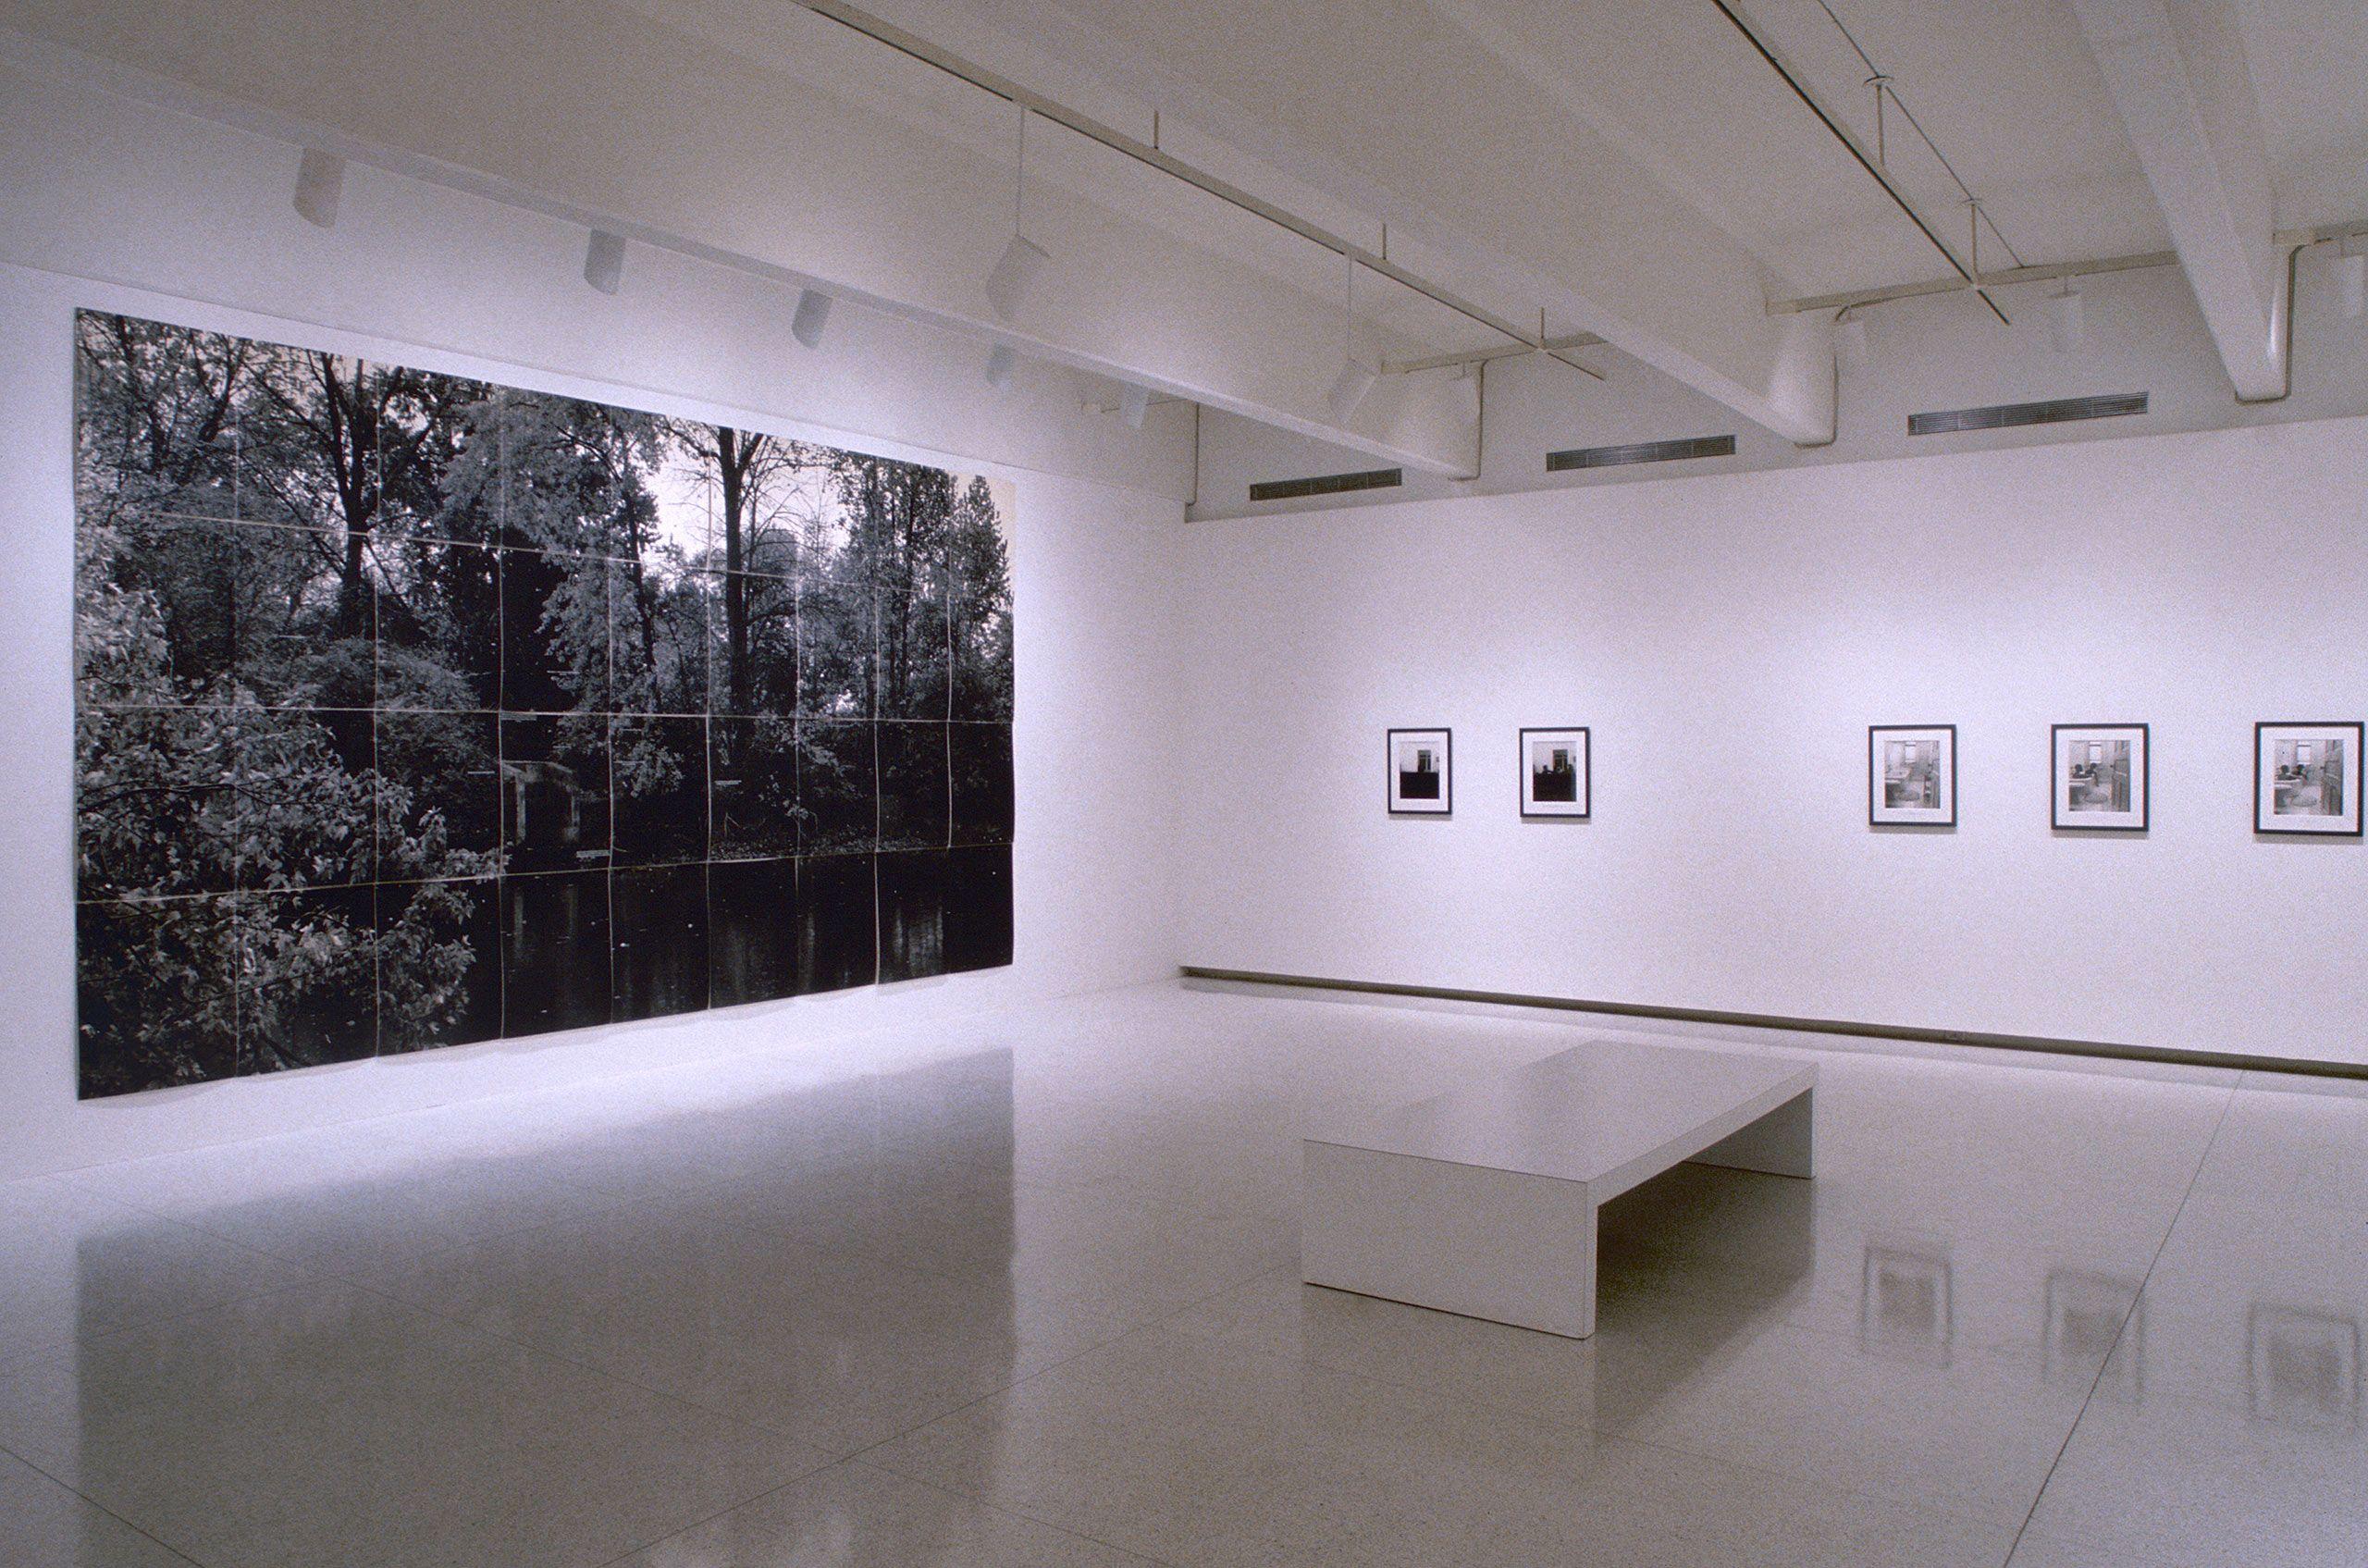 """Scenarios: Recent Work by Lorna Simpson"", Walker Art Center, Minneapolis, MN 1999"